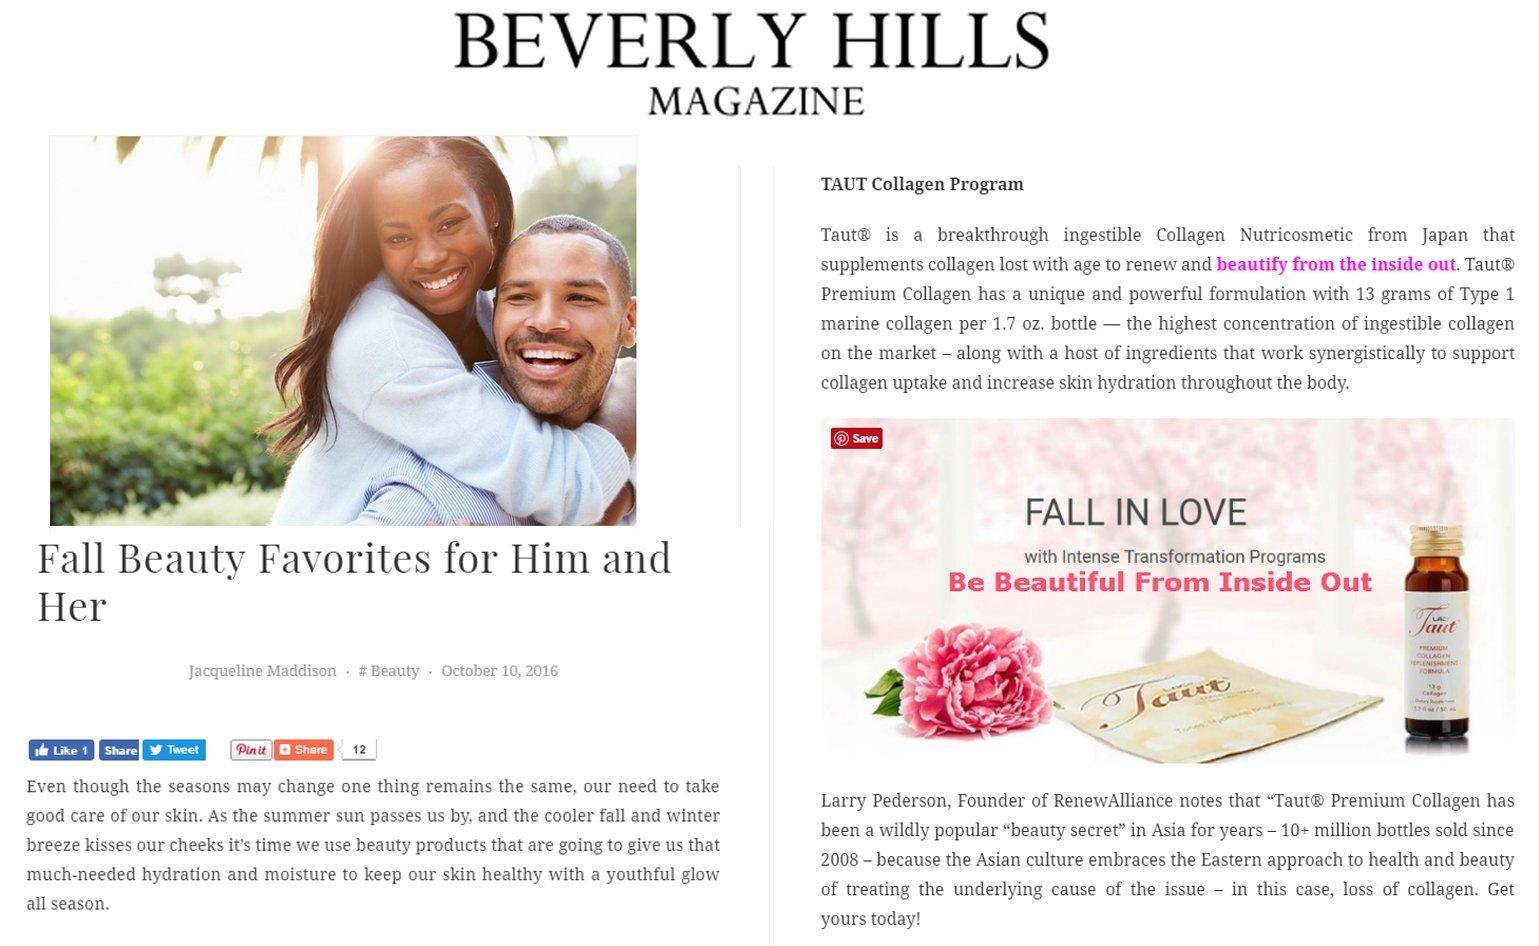 Taut Premium Collagen Drink https://www.beverlyhillsmagazine.com/beauty/fall-beauty-favorites/#.WA56W-ArKUn